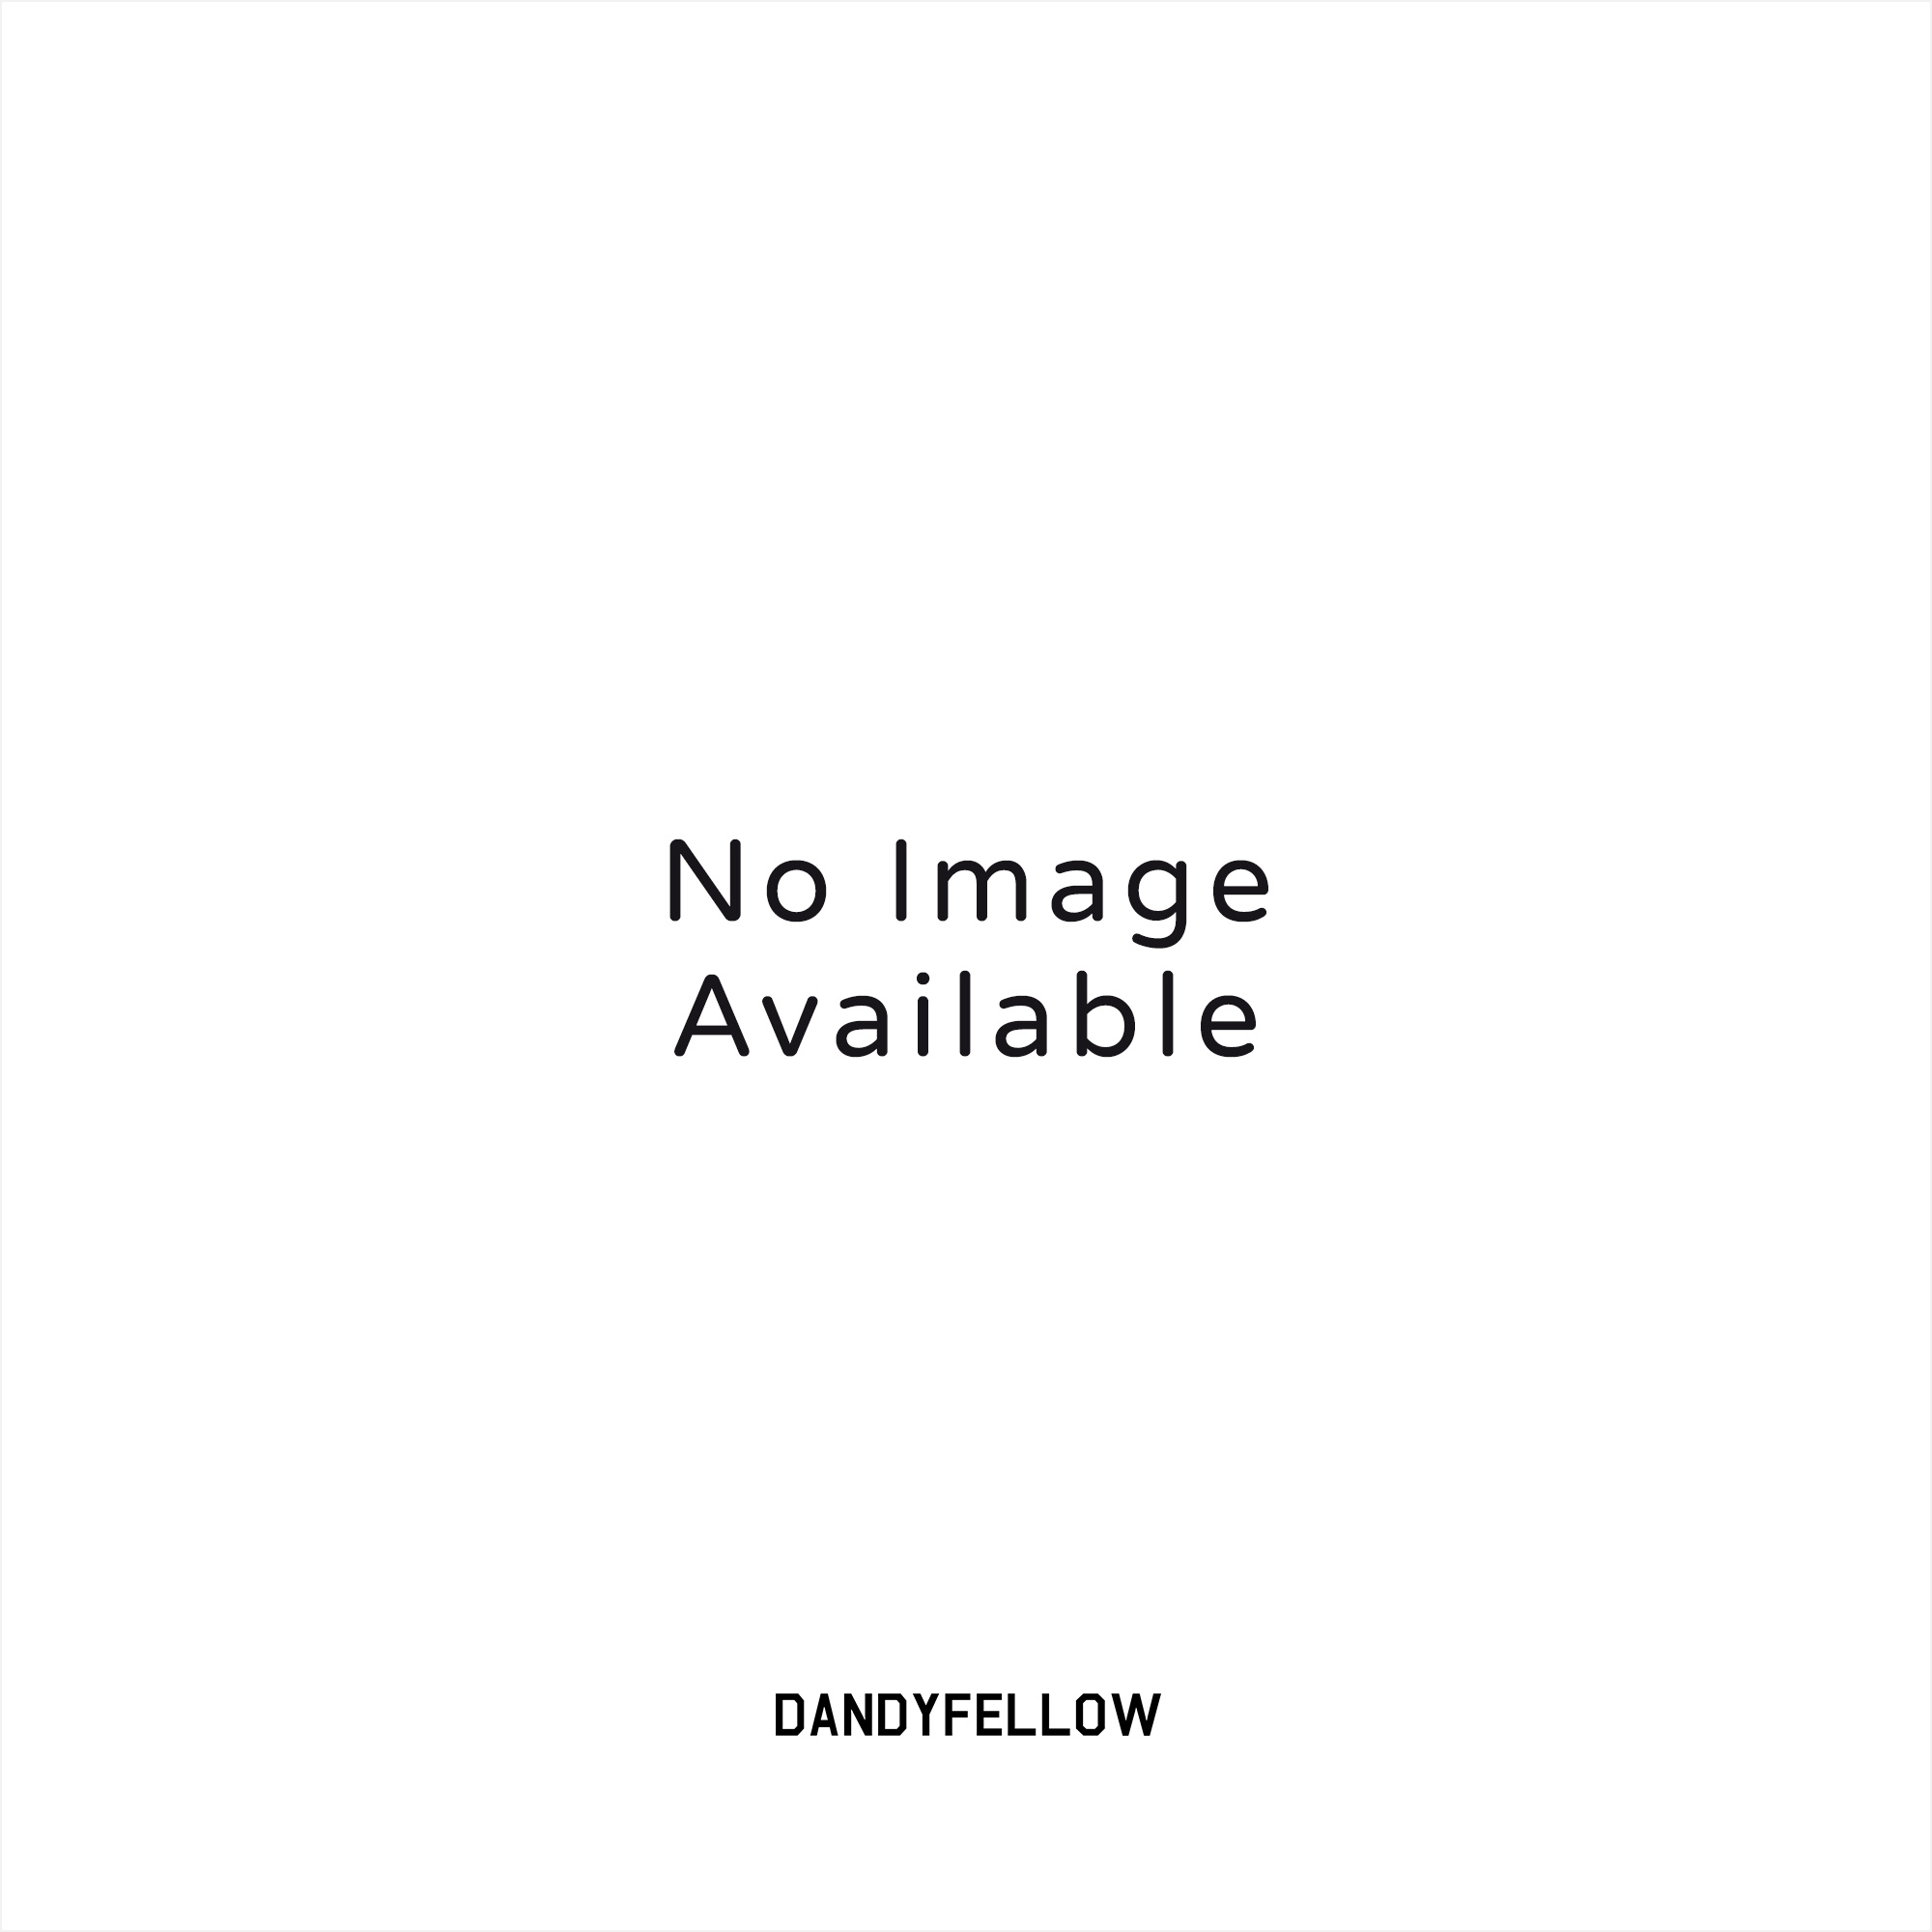 22c46de038492 New Balance 997 Made In US Grey M997WEB | Dandy Fellow